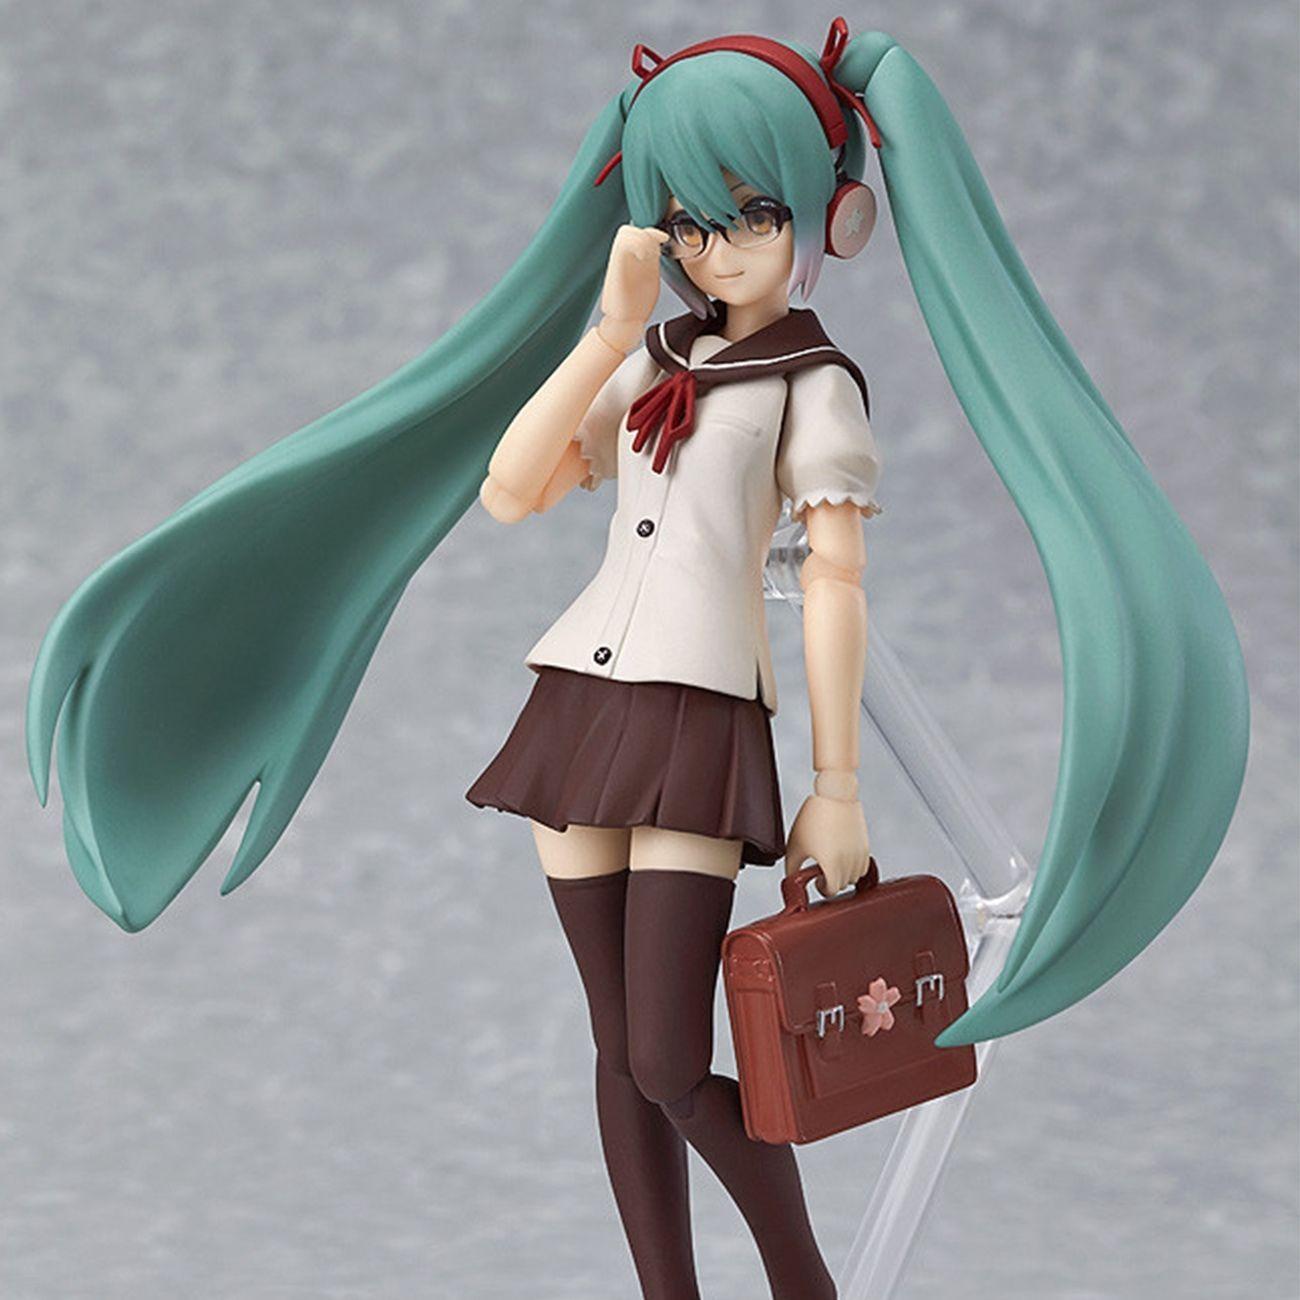 New Figma Vocaloid Hatsune Miku Sailor Uniform Ver SP 050 Max Factory Figure…